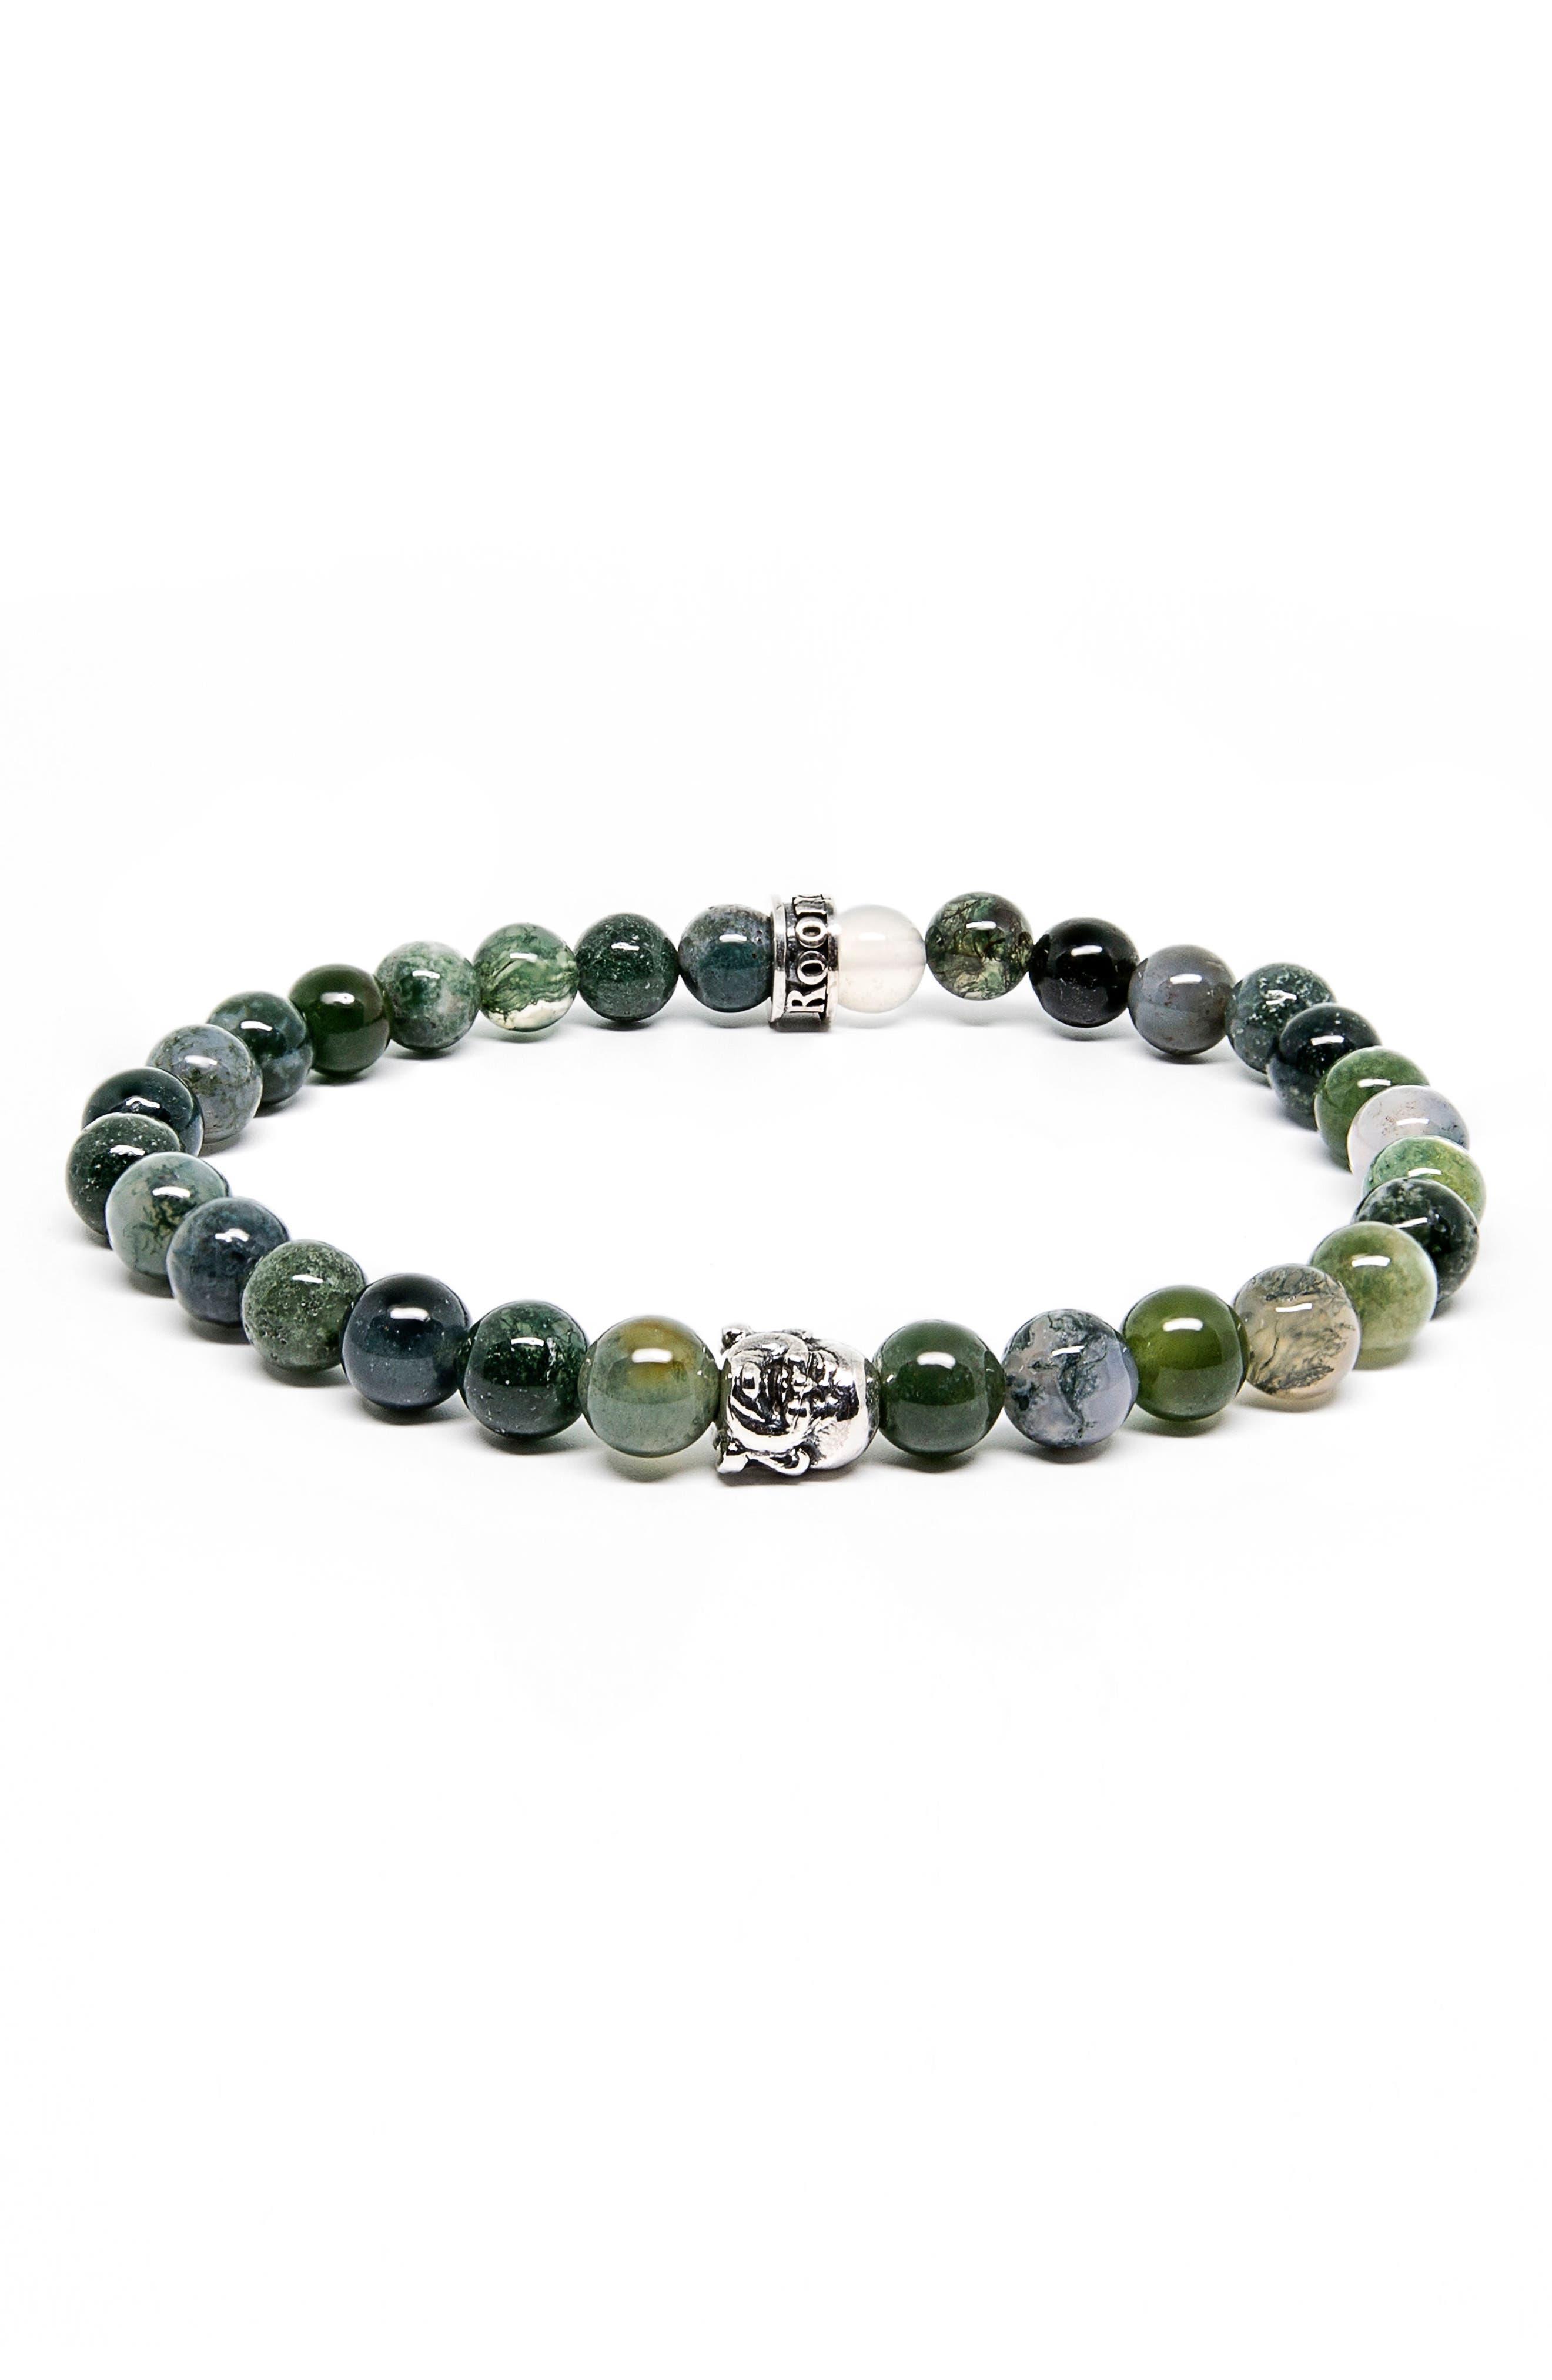 Moss Agate Buddha Stretch Bracelet,                         Main,                         color, Green